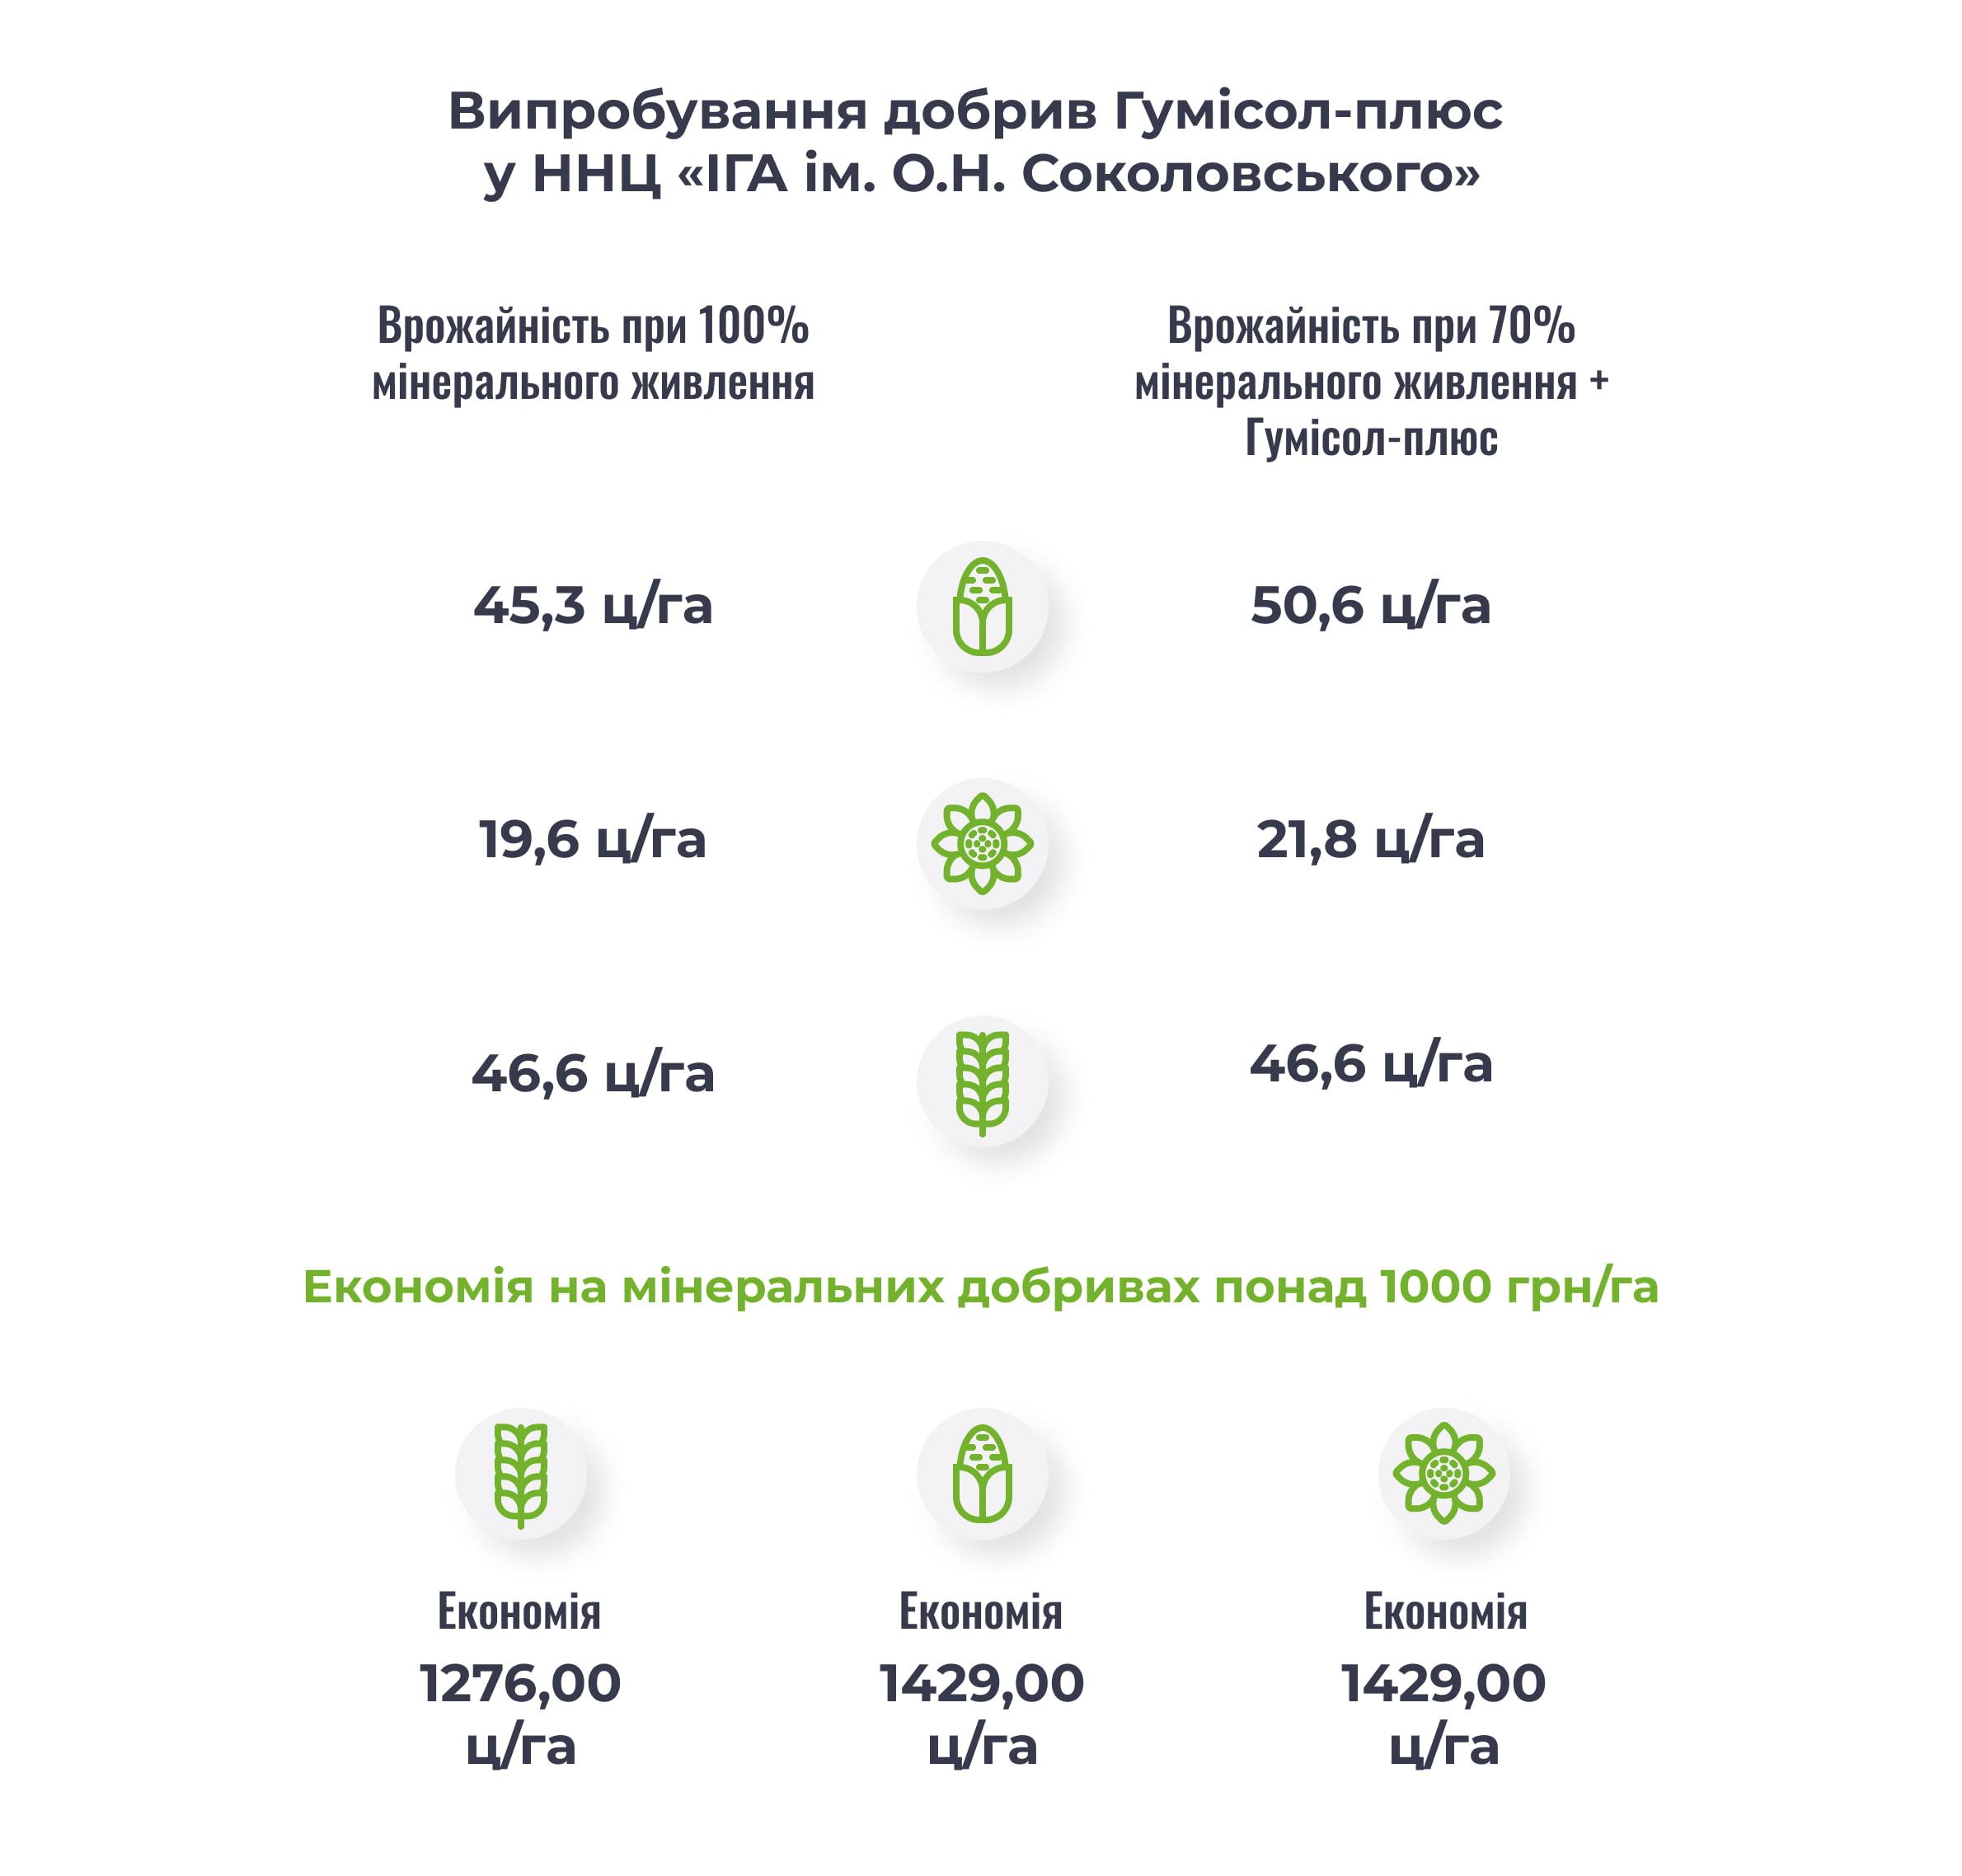 fertilizers_saving_money